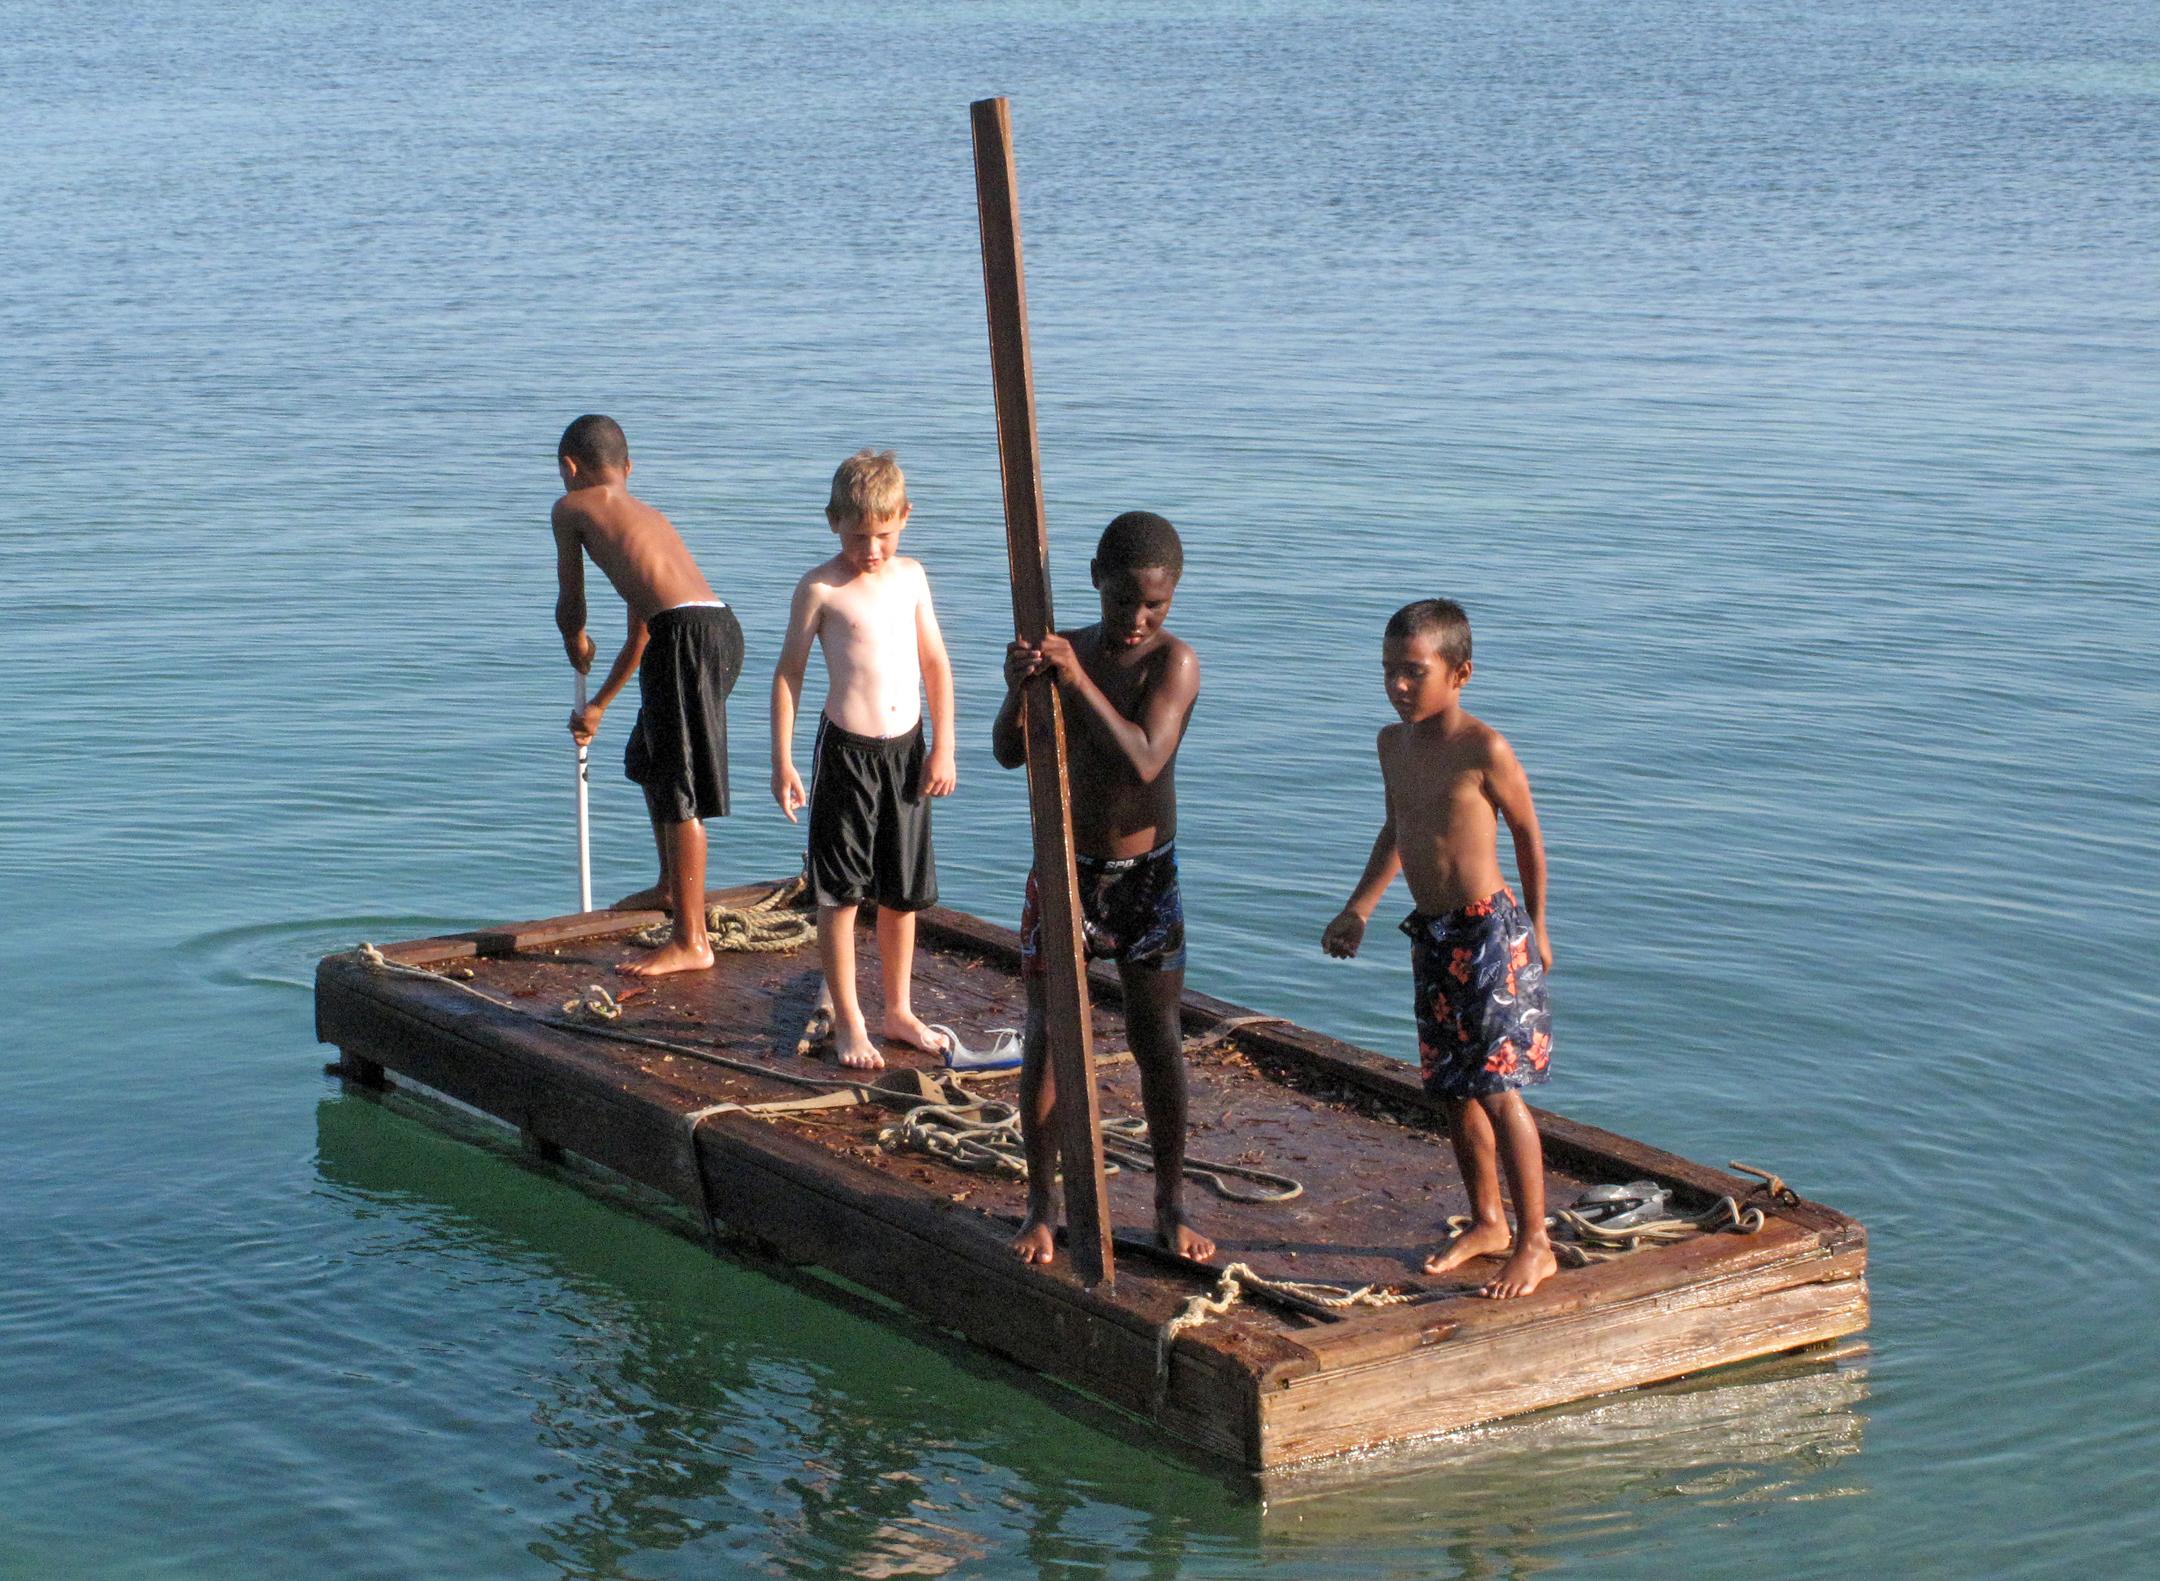 bahamas, abaco, green turtle cay, children, travel